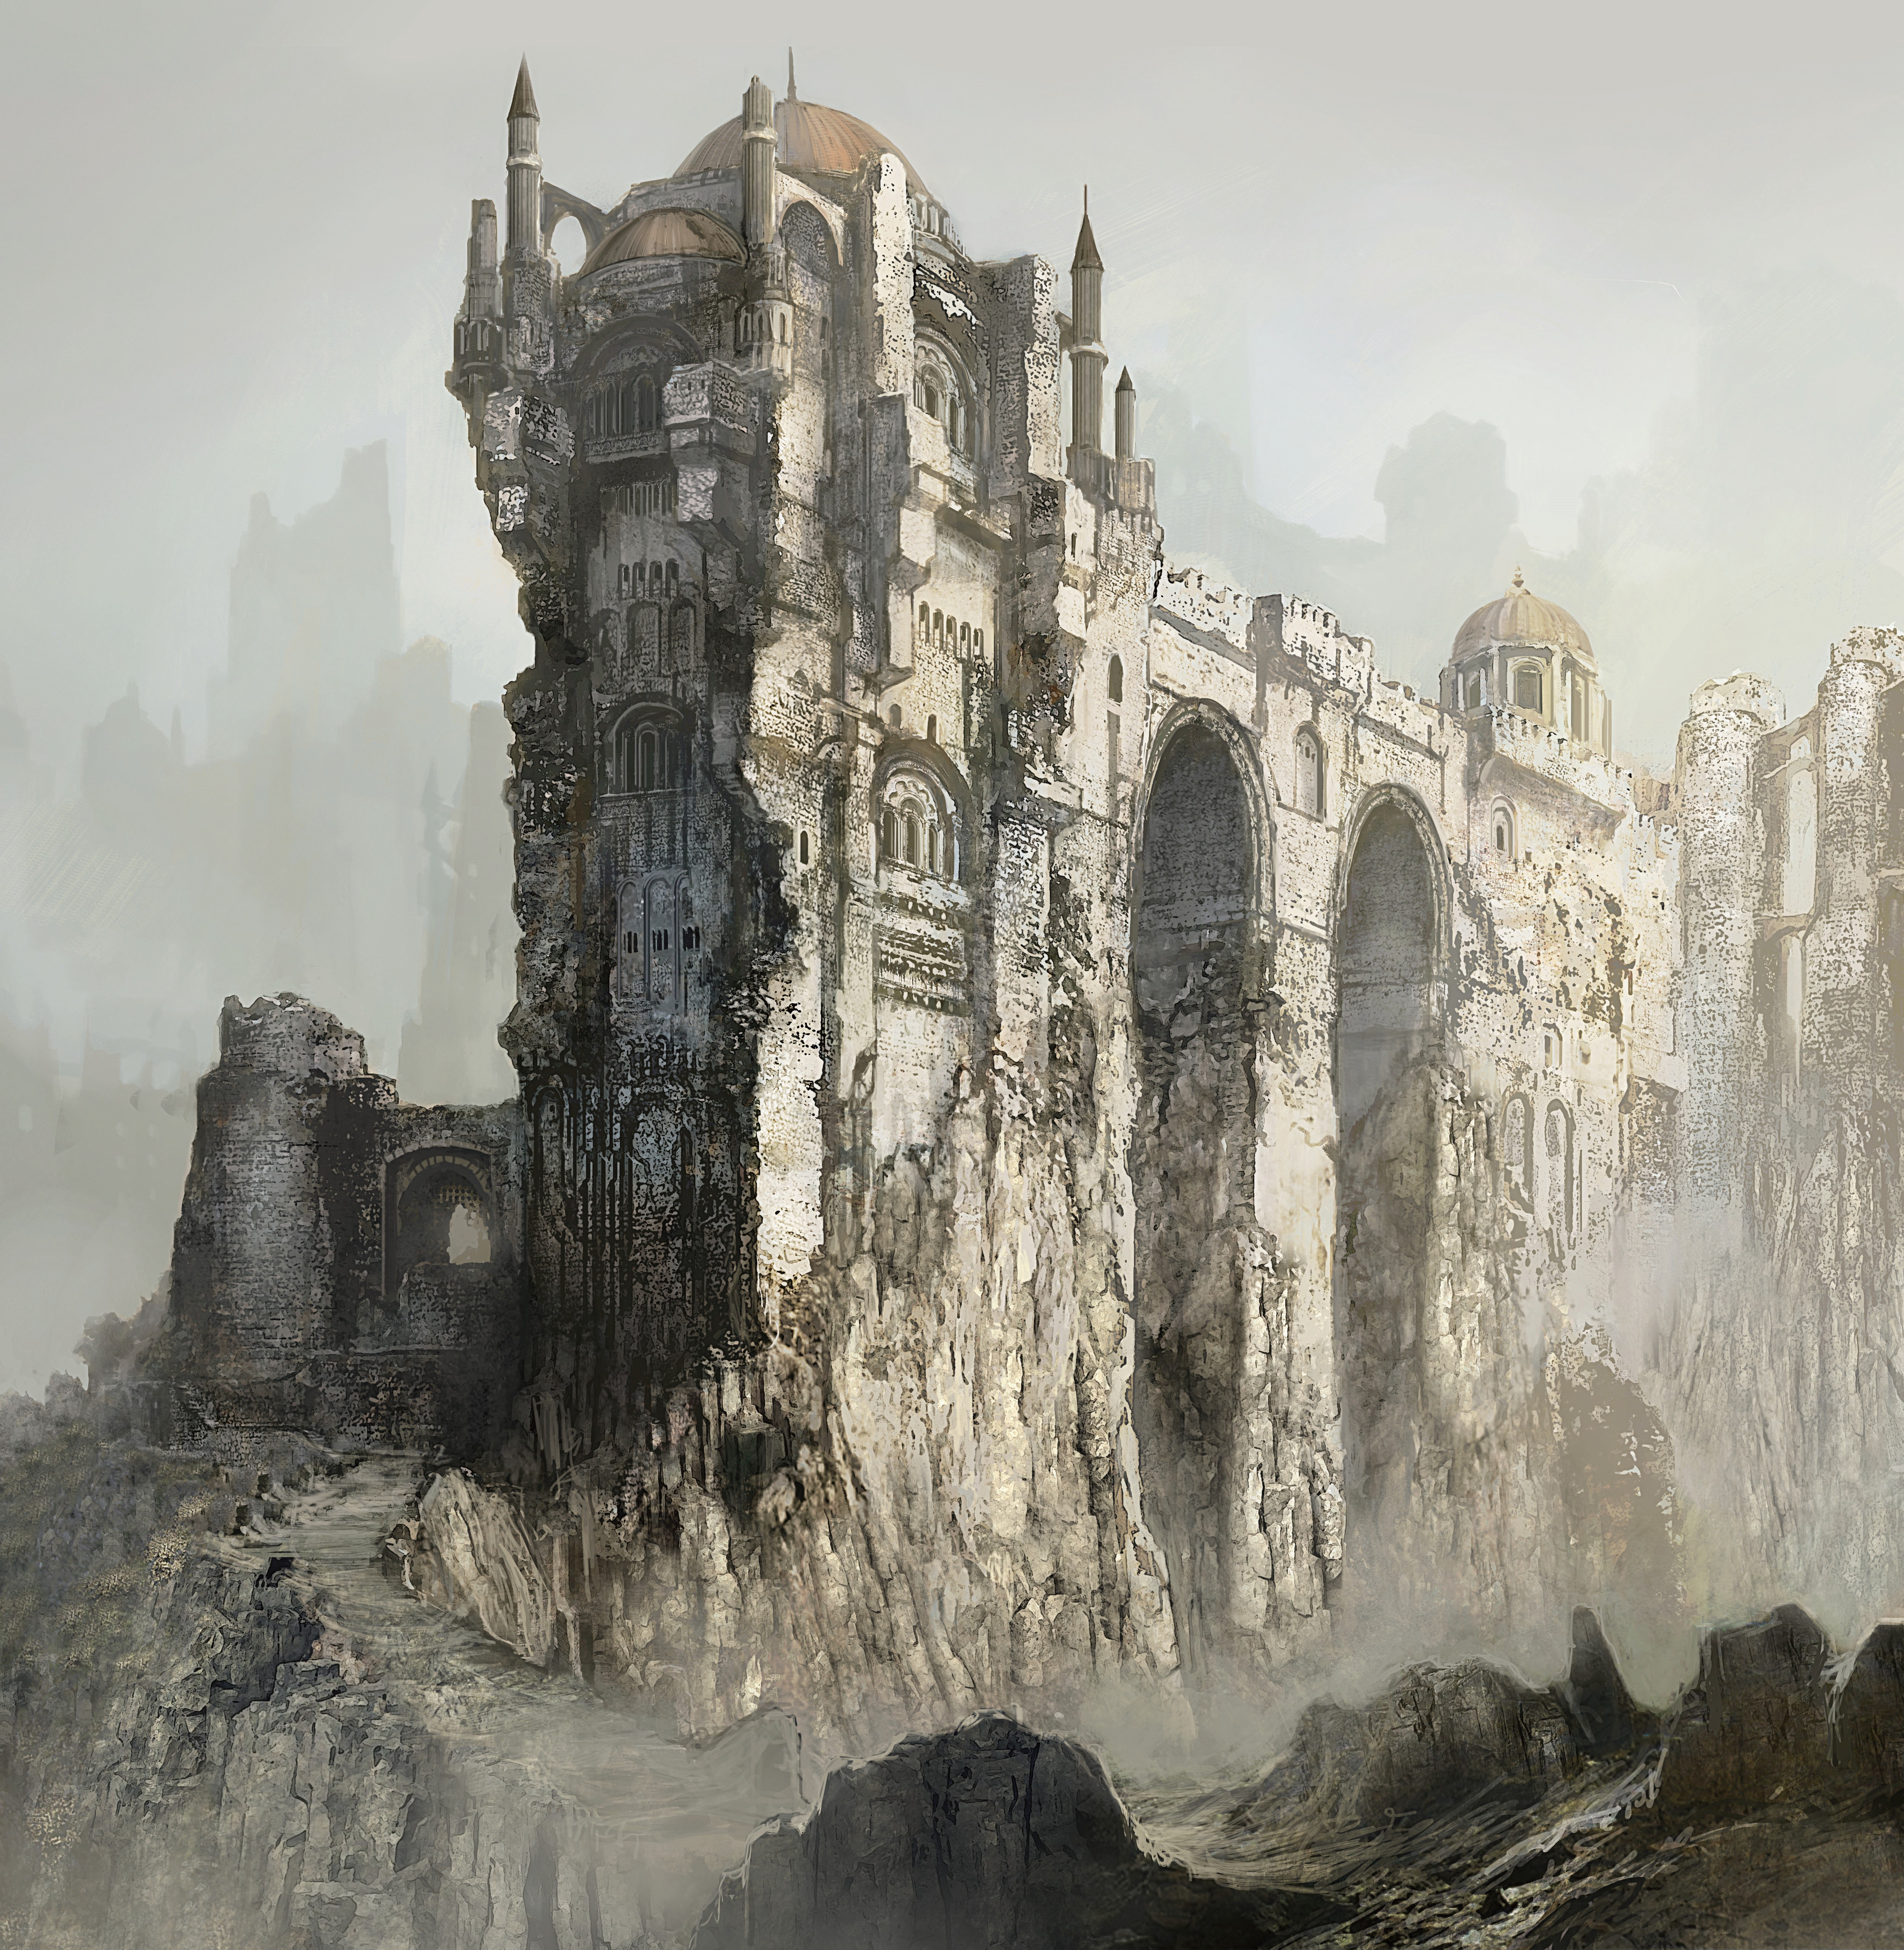 New Dark Souls III Screens And Artwork